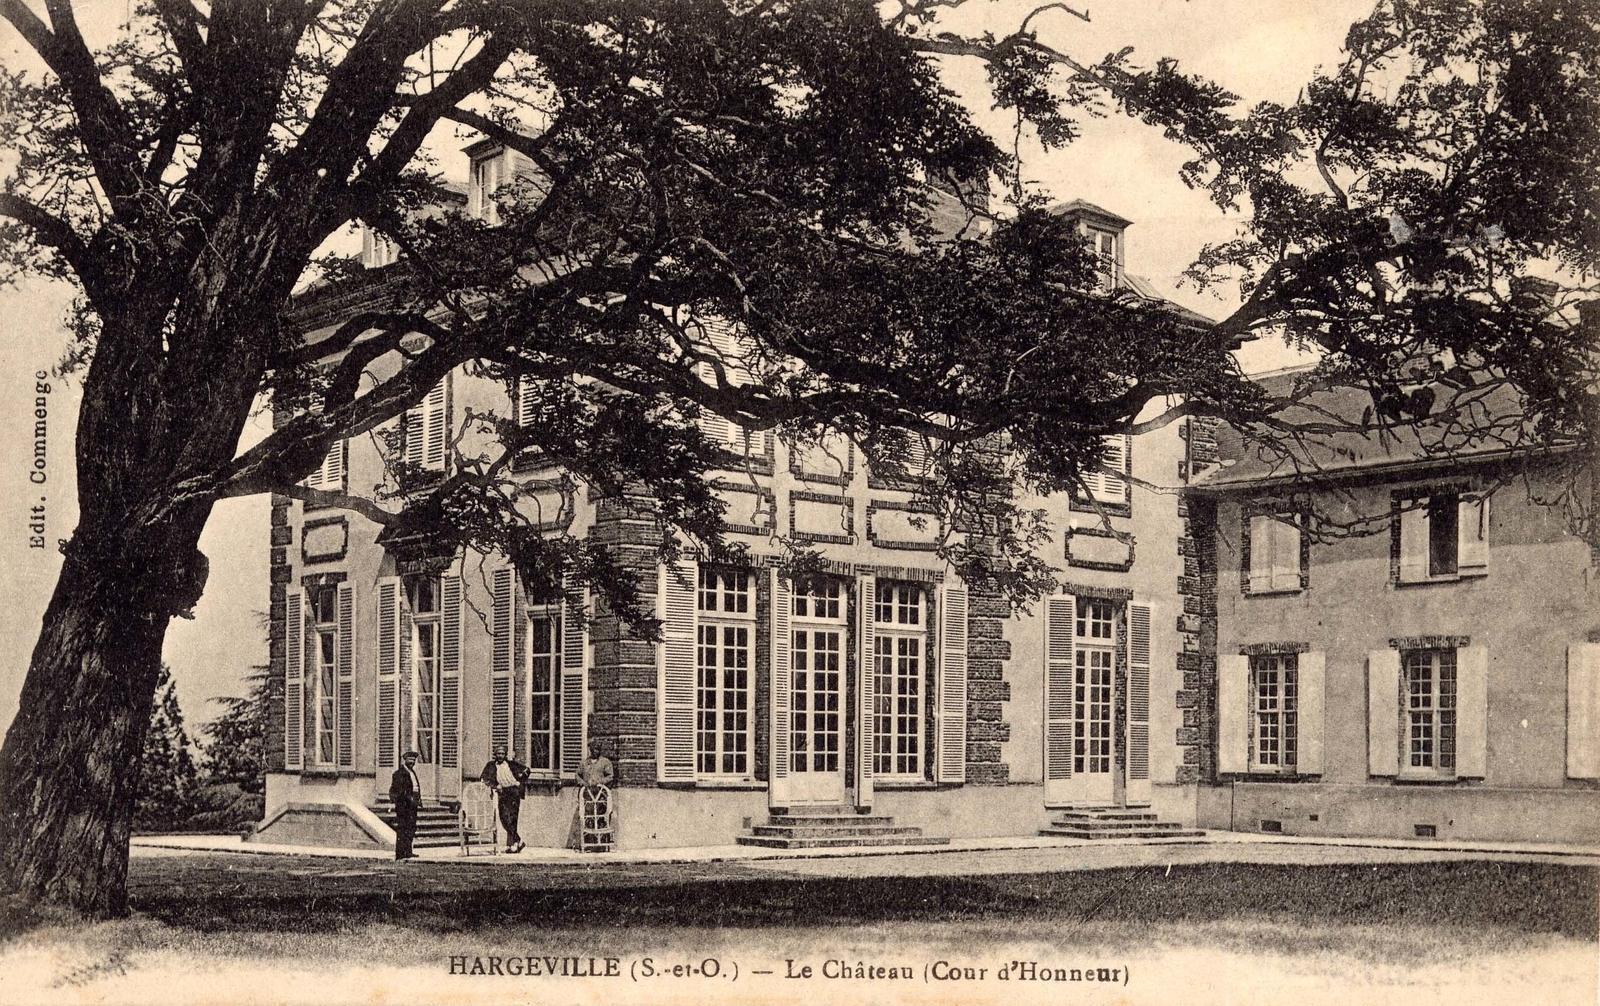 Hargeville chateau 1